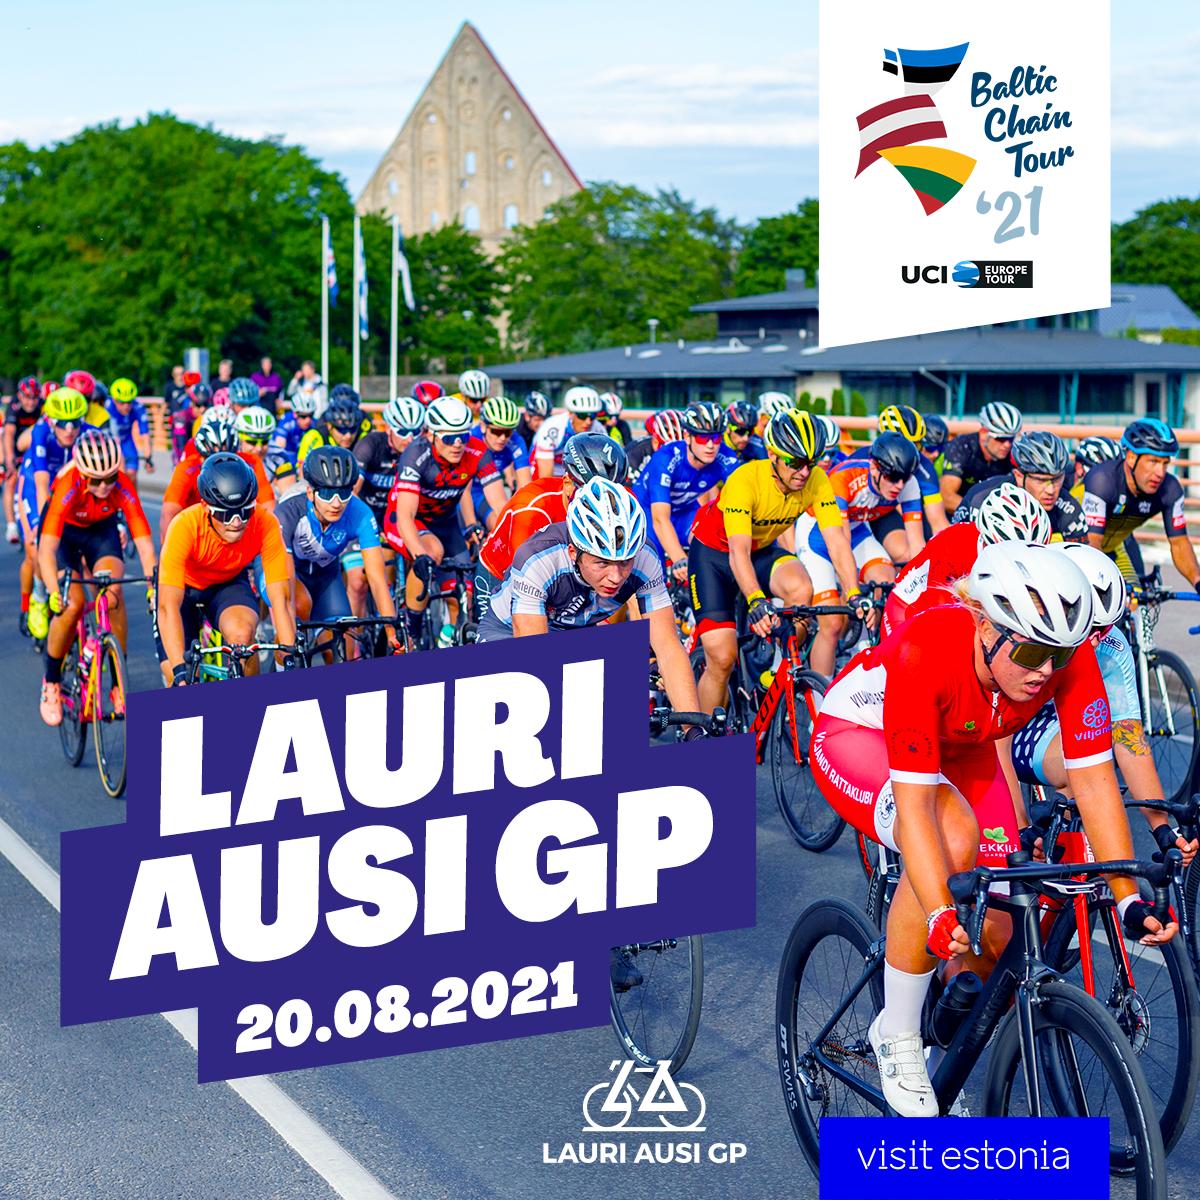 Lauri-Ausi-GP-1200x1200px.png